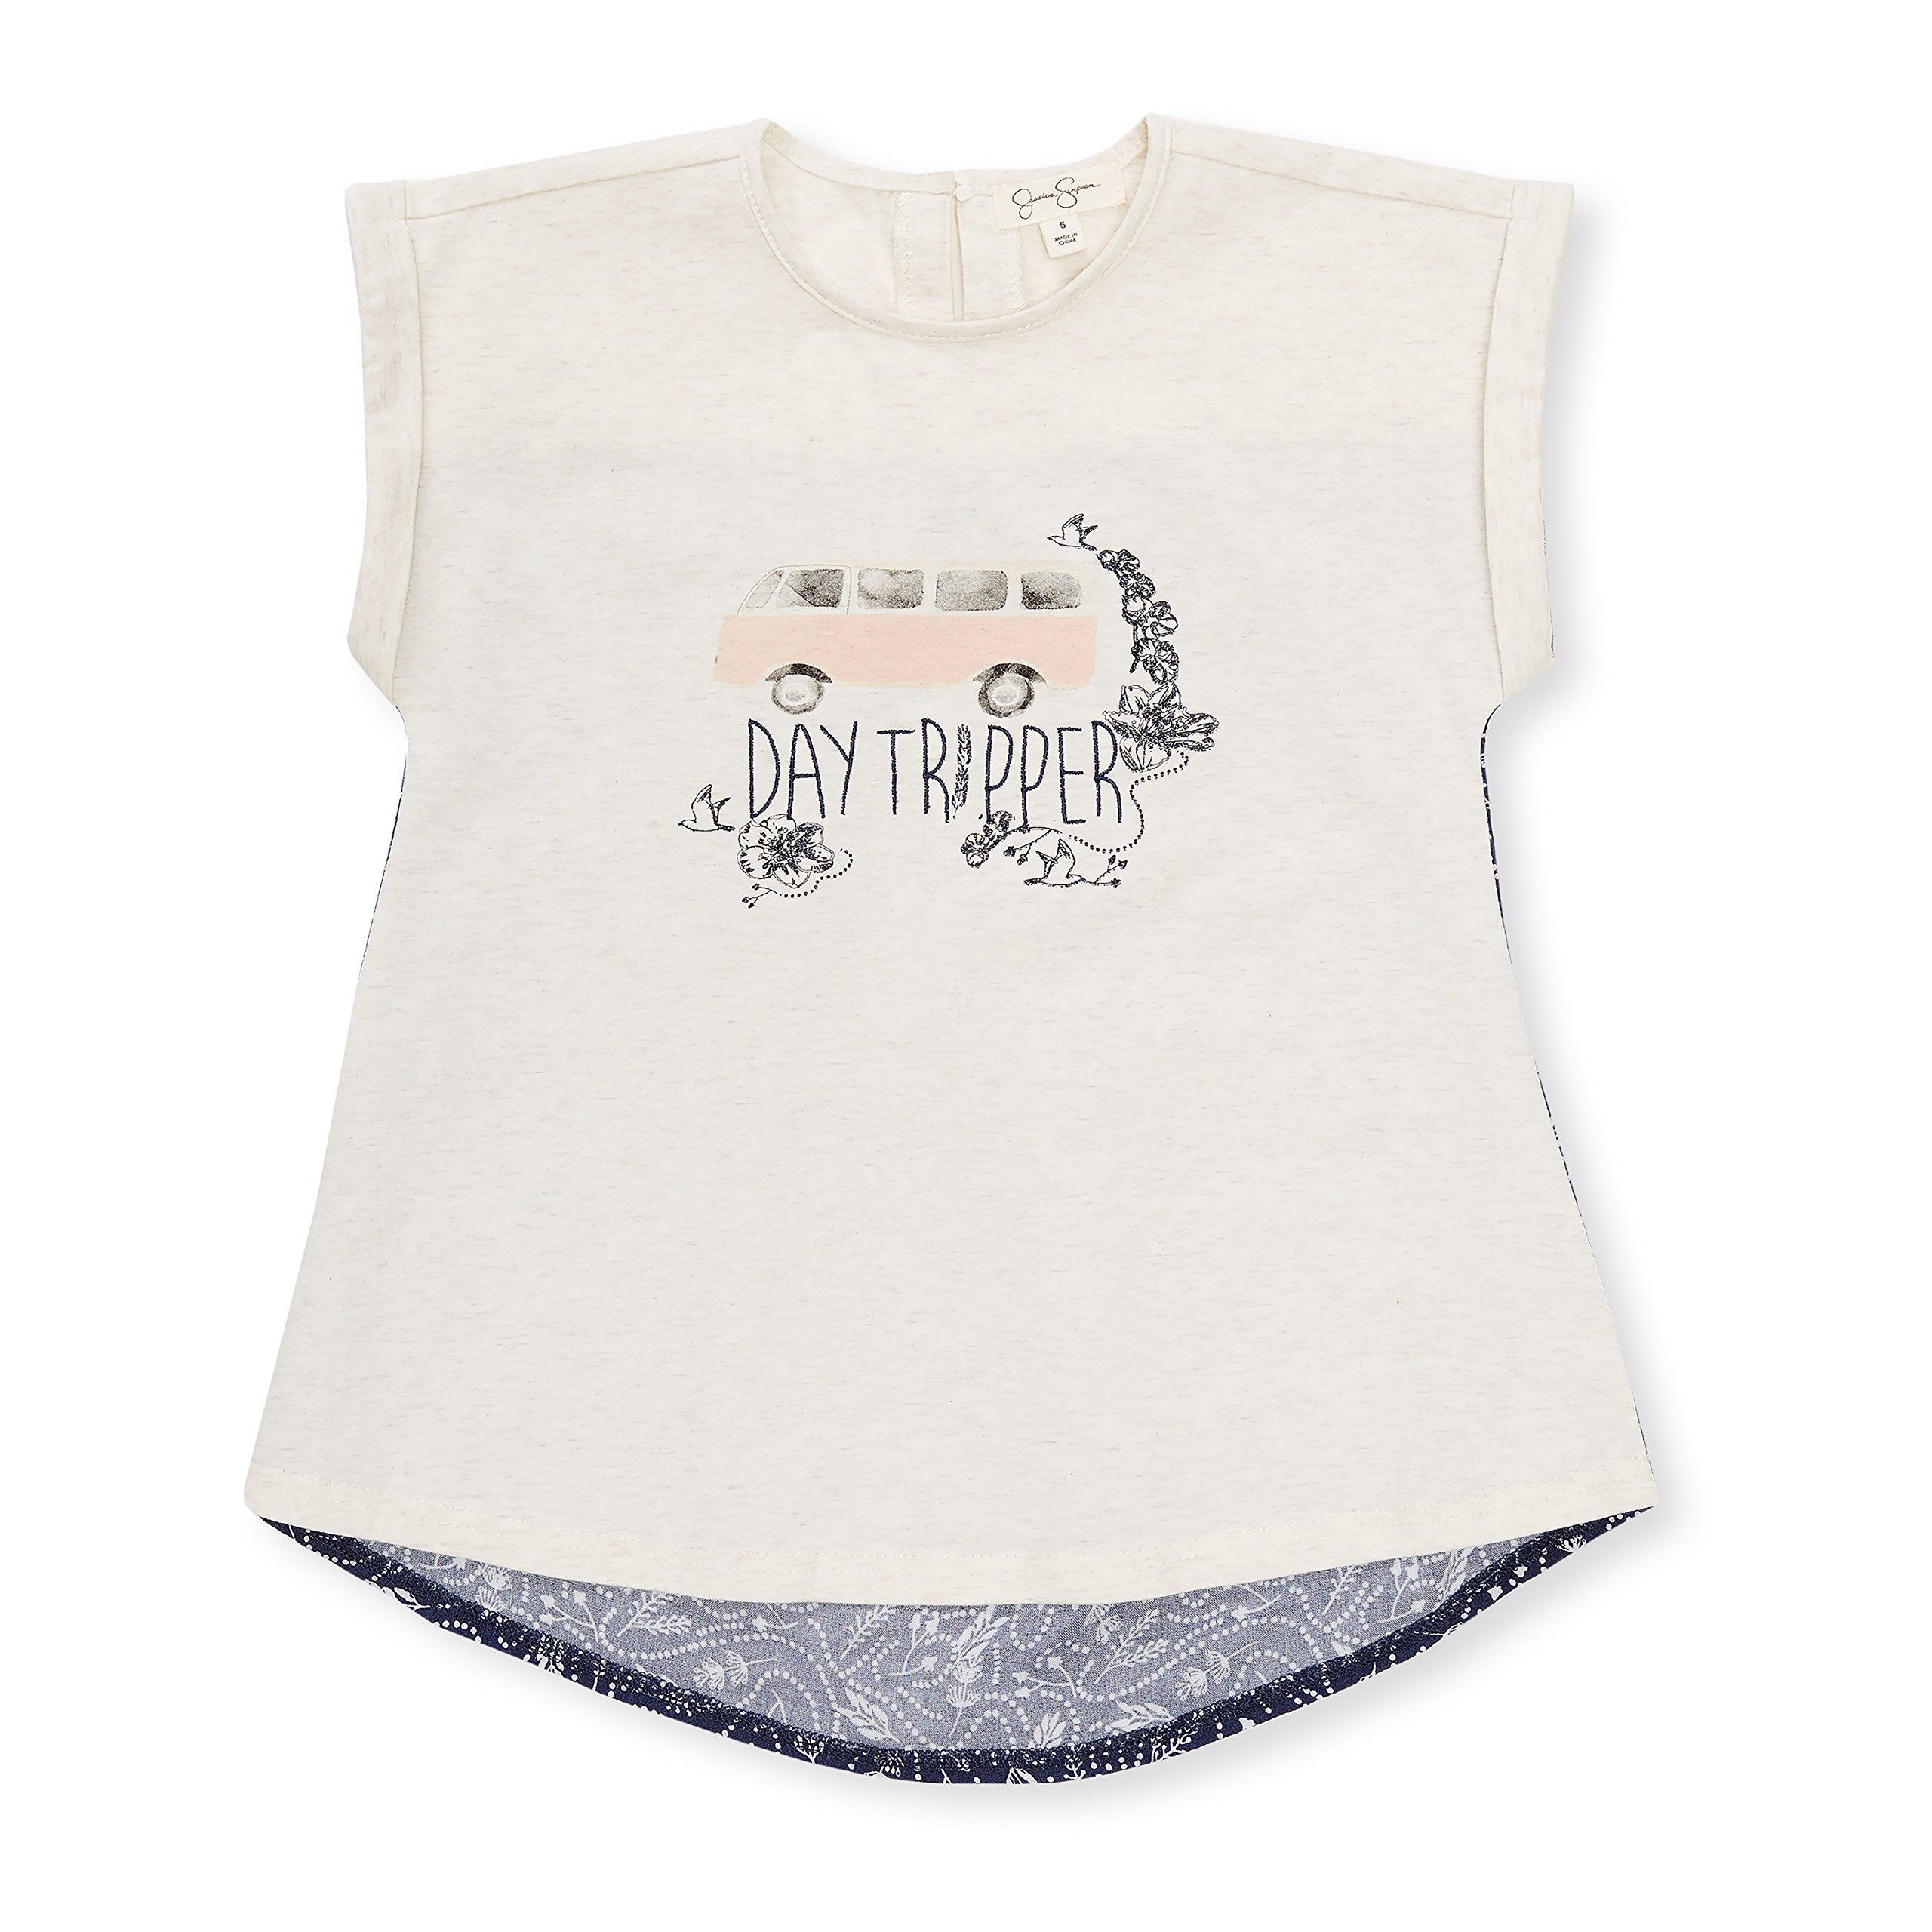 Jessica Simpson Girl's Sleeveless Crewneck High Low Keyhole Back Day Tripper Shirt Heather Oatmeal 6